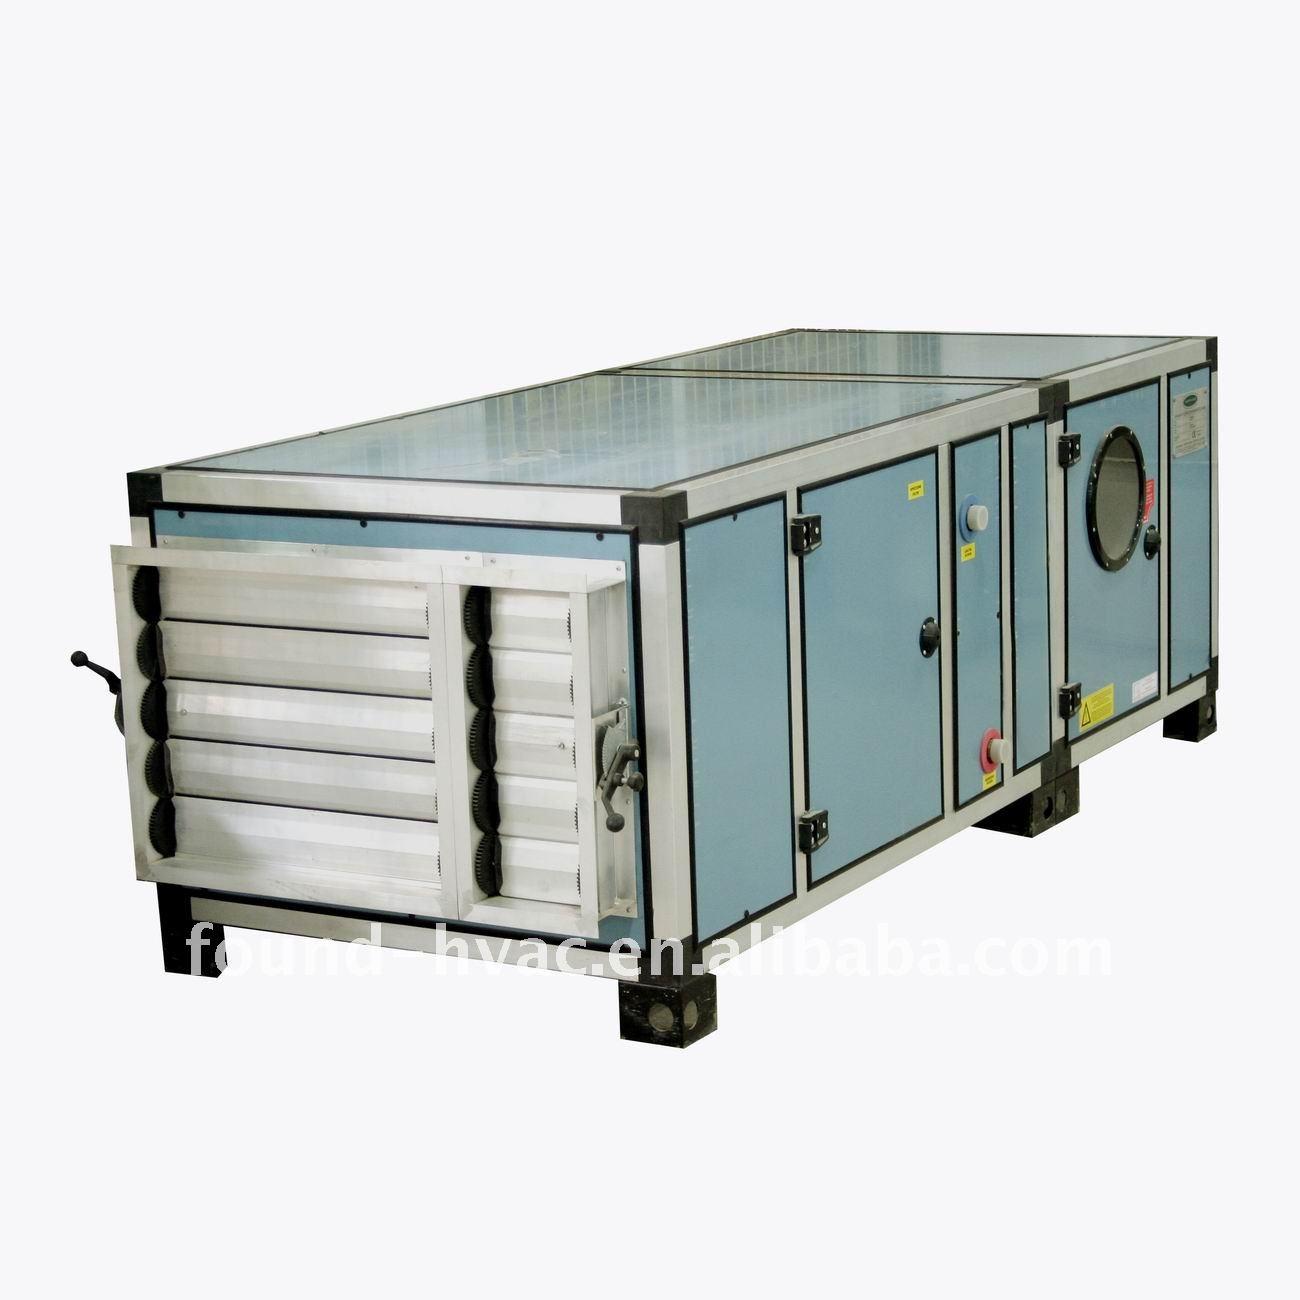 Composite Units air handling unit AHU Air conditioner #537078